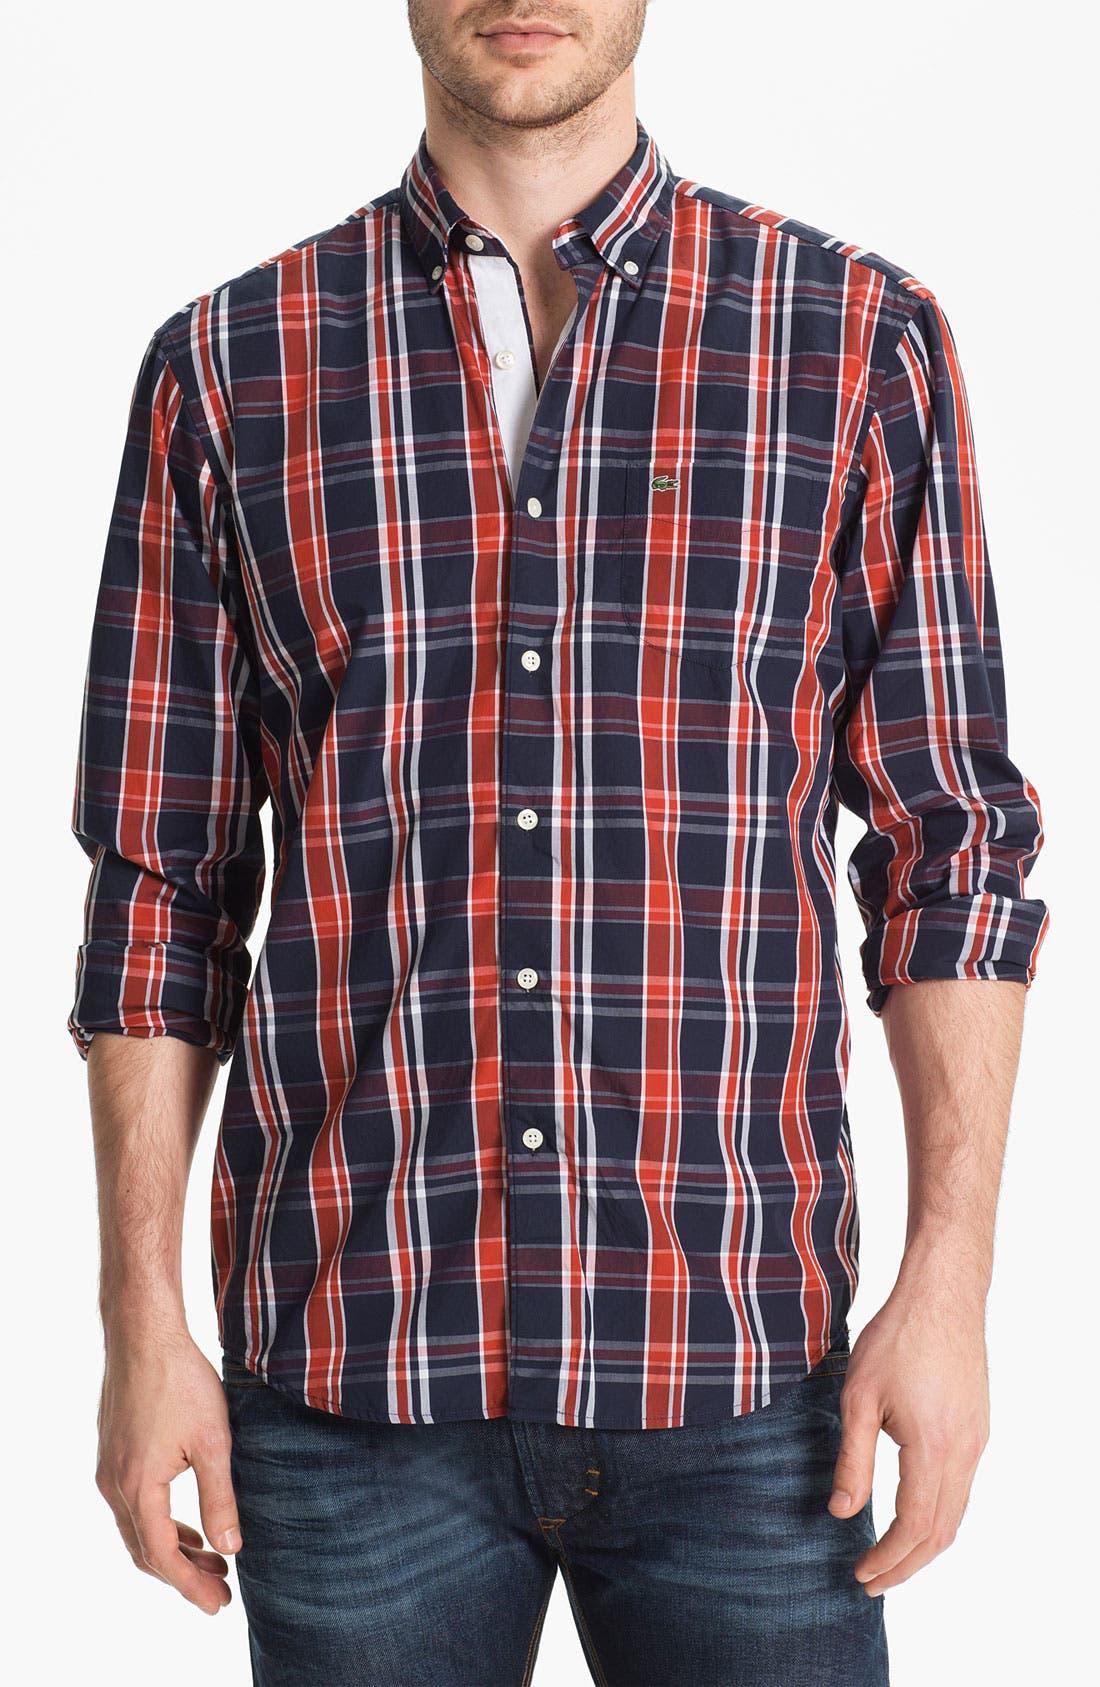 Main Image - Lacoste Plaid Woven Shirt